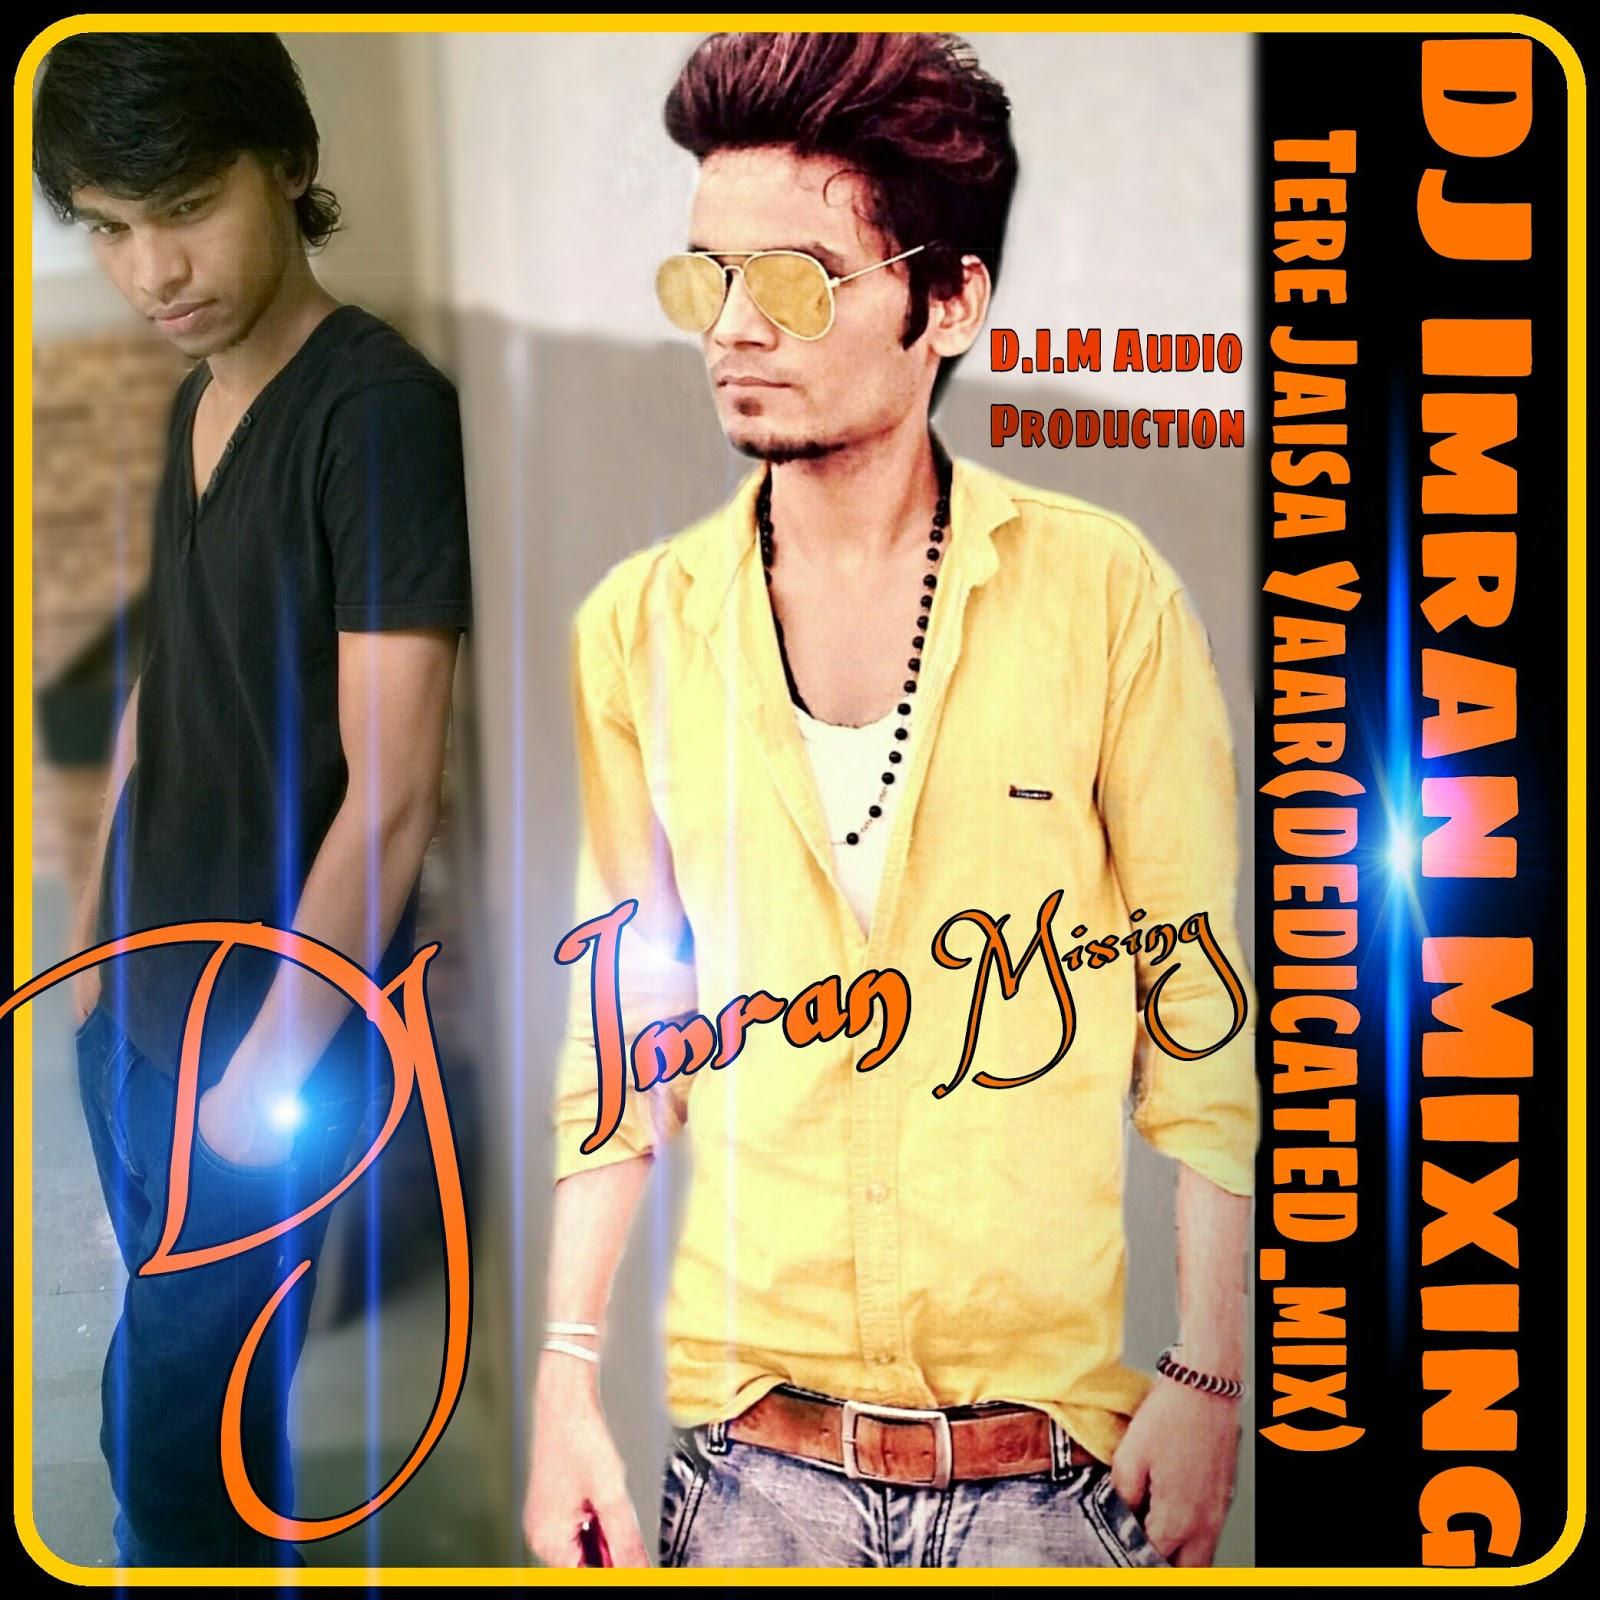 Imran Khan Song I Am Rider Mp3 Download: DJ Imran Mixing_D.I.M Audio Sagar M.P.: Download:-TERE